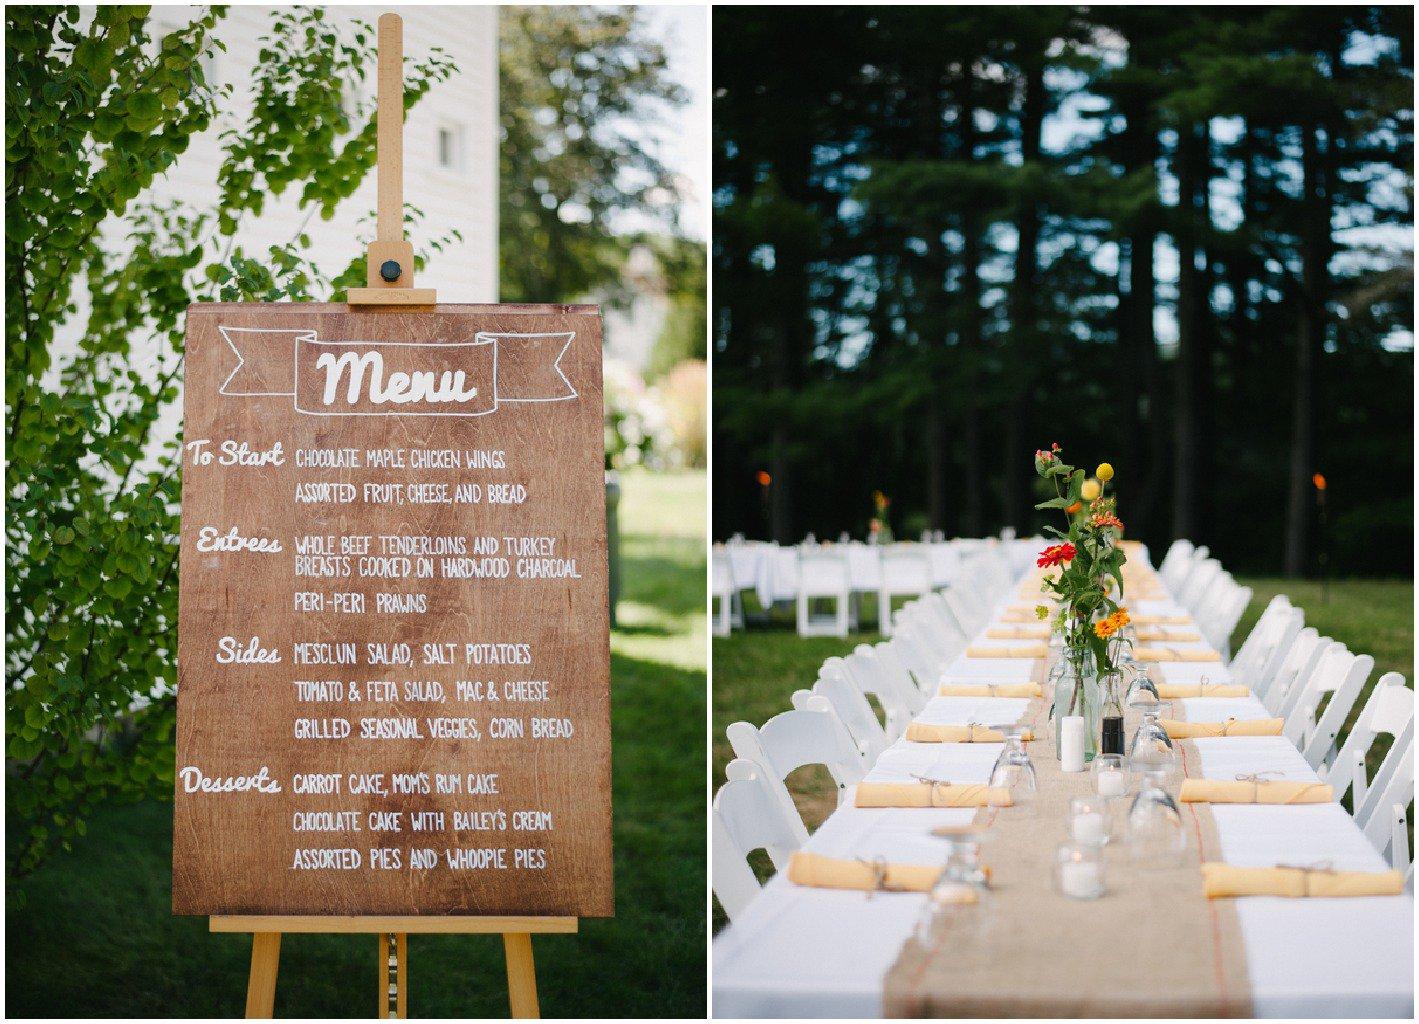 backyard wedding decor photo - 1